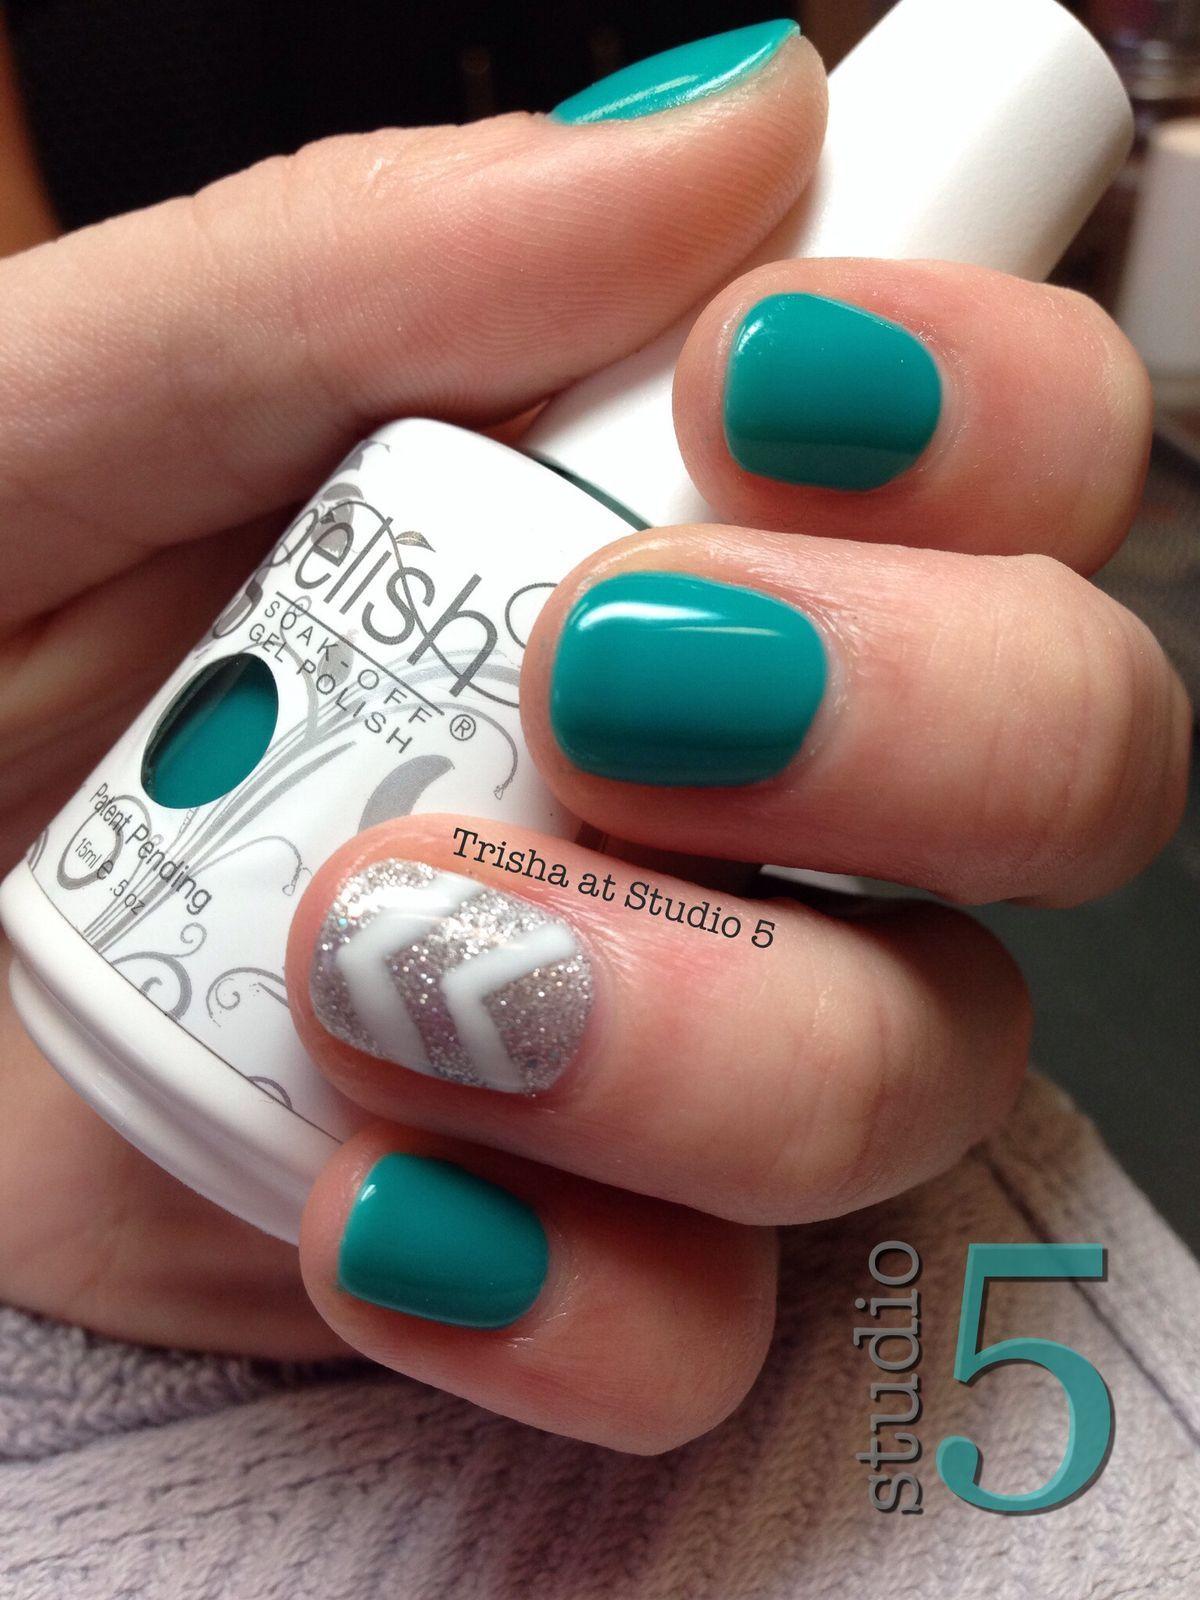 Daebdedefdcg pixels nails